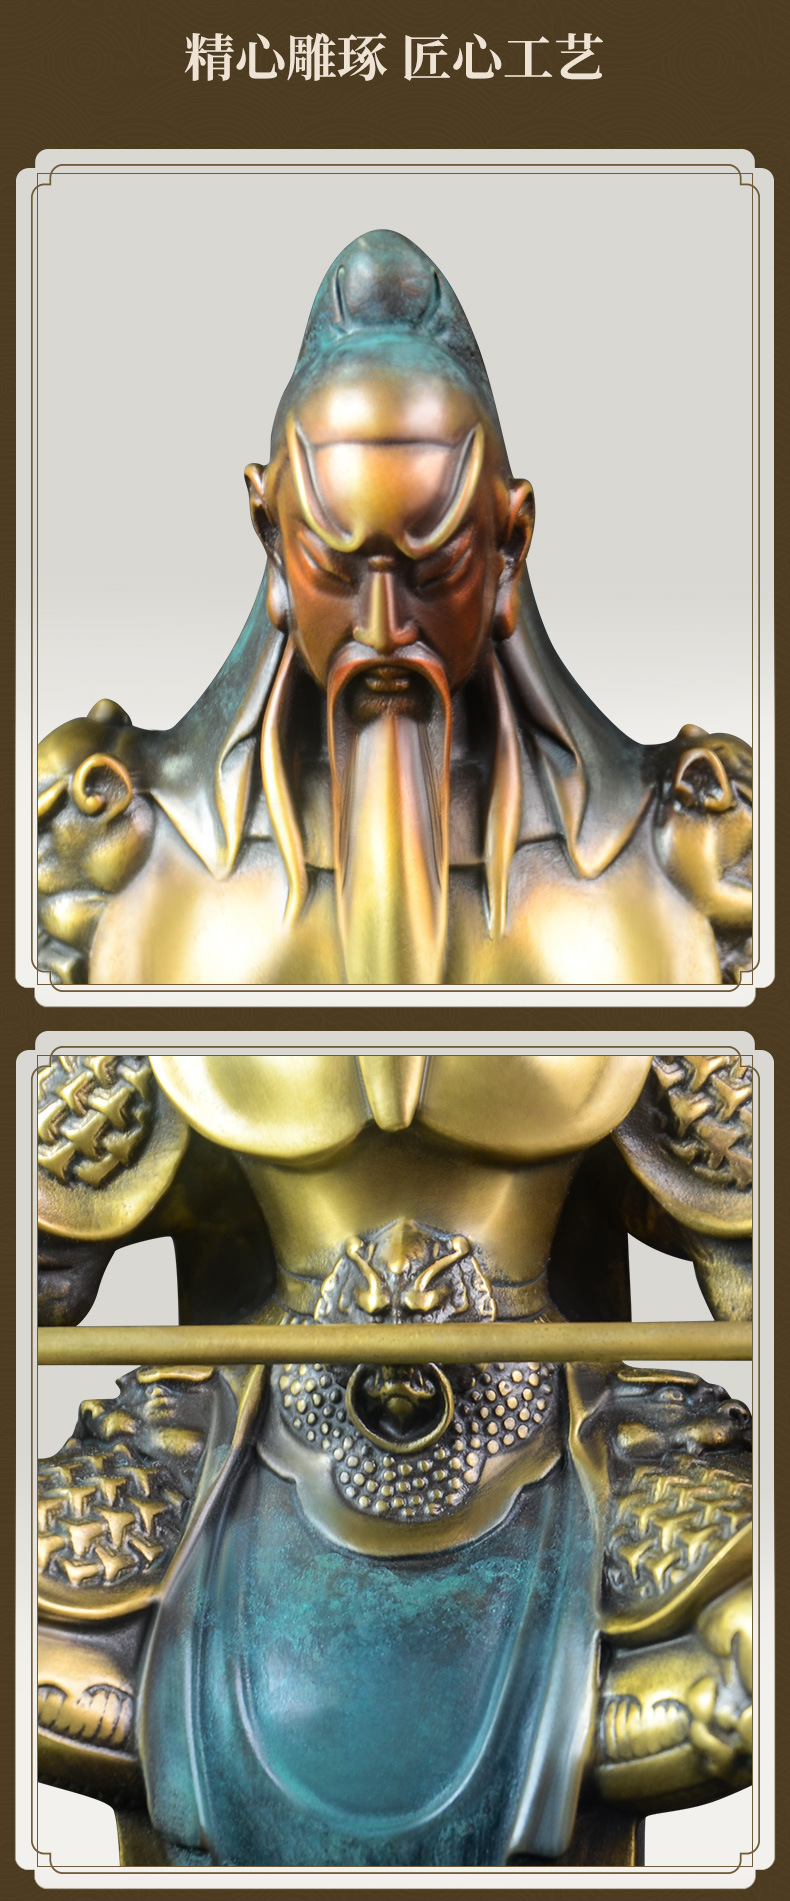 1J614001 kwan kong statue sale (13)